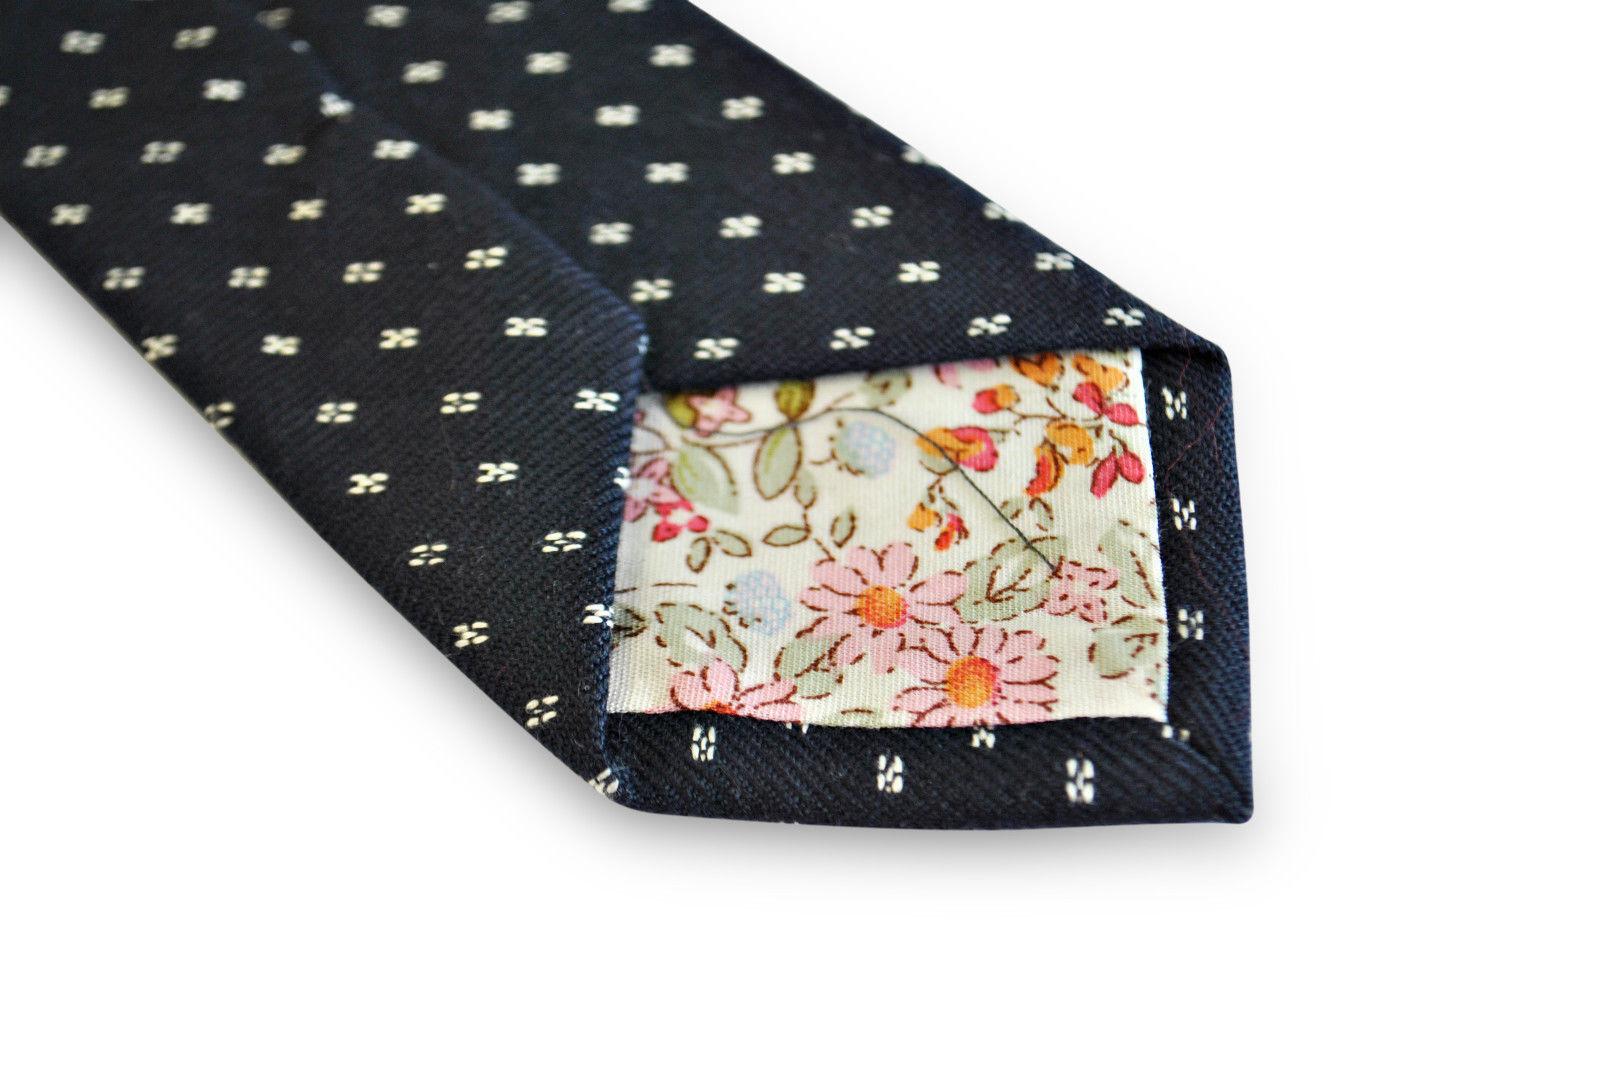 Frederick Thomas bleu marine cravate avec blanc taches en 100% coton ft3194